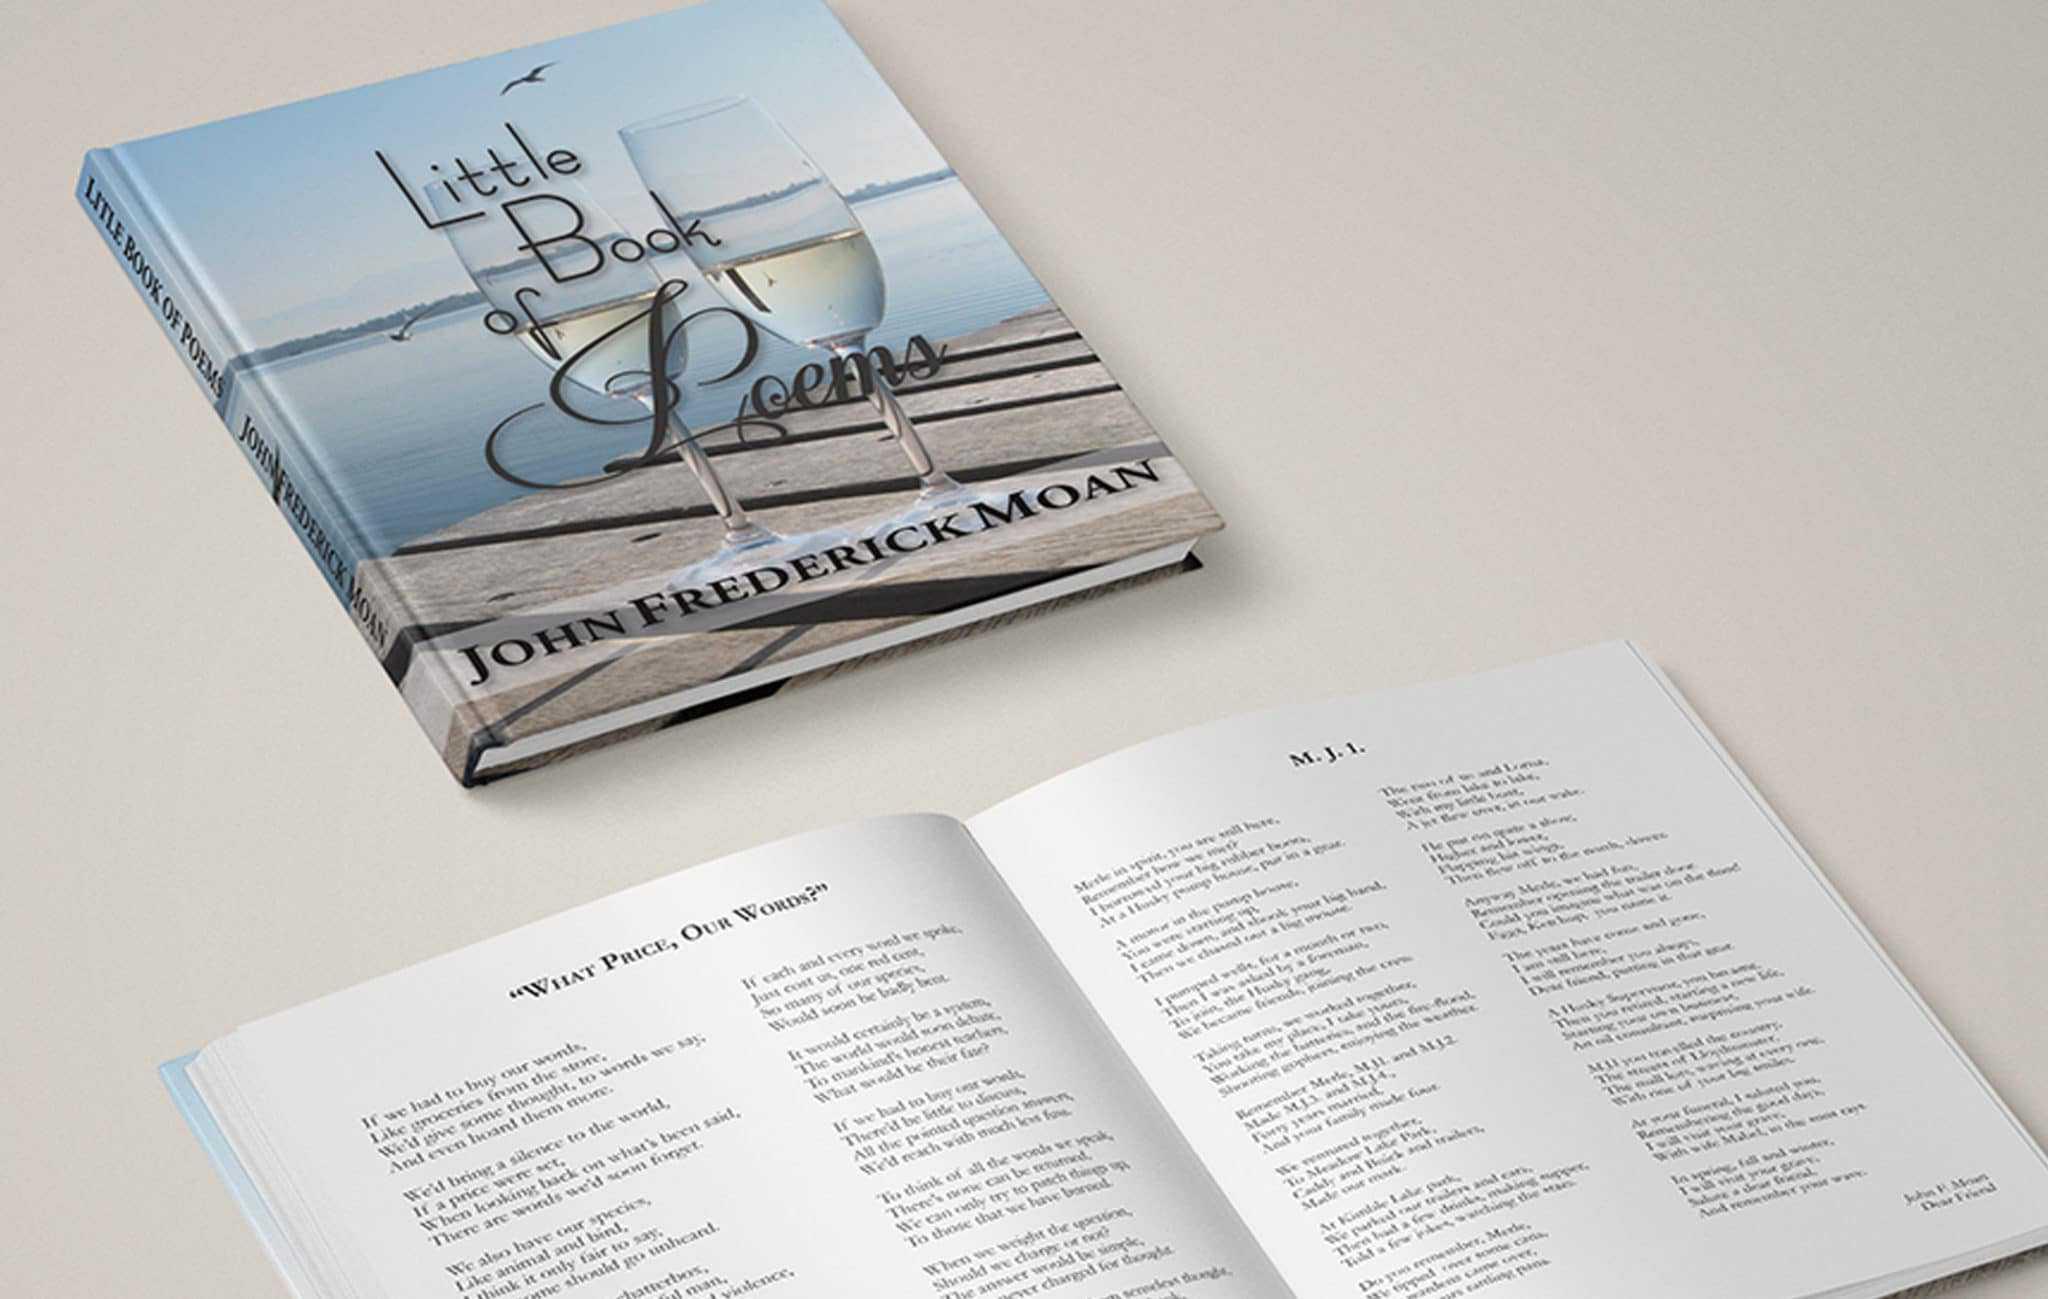 Little Book of Poems by John Moan